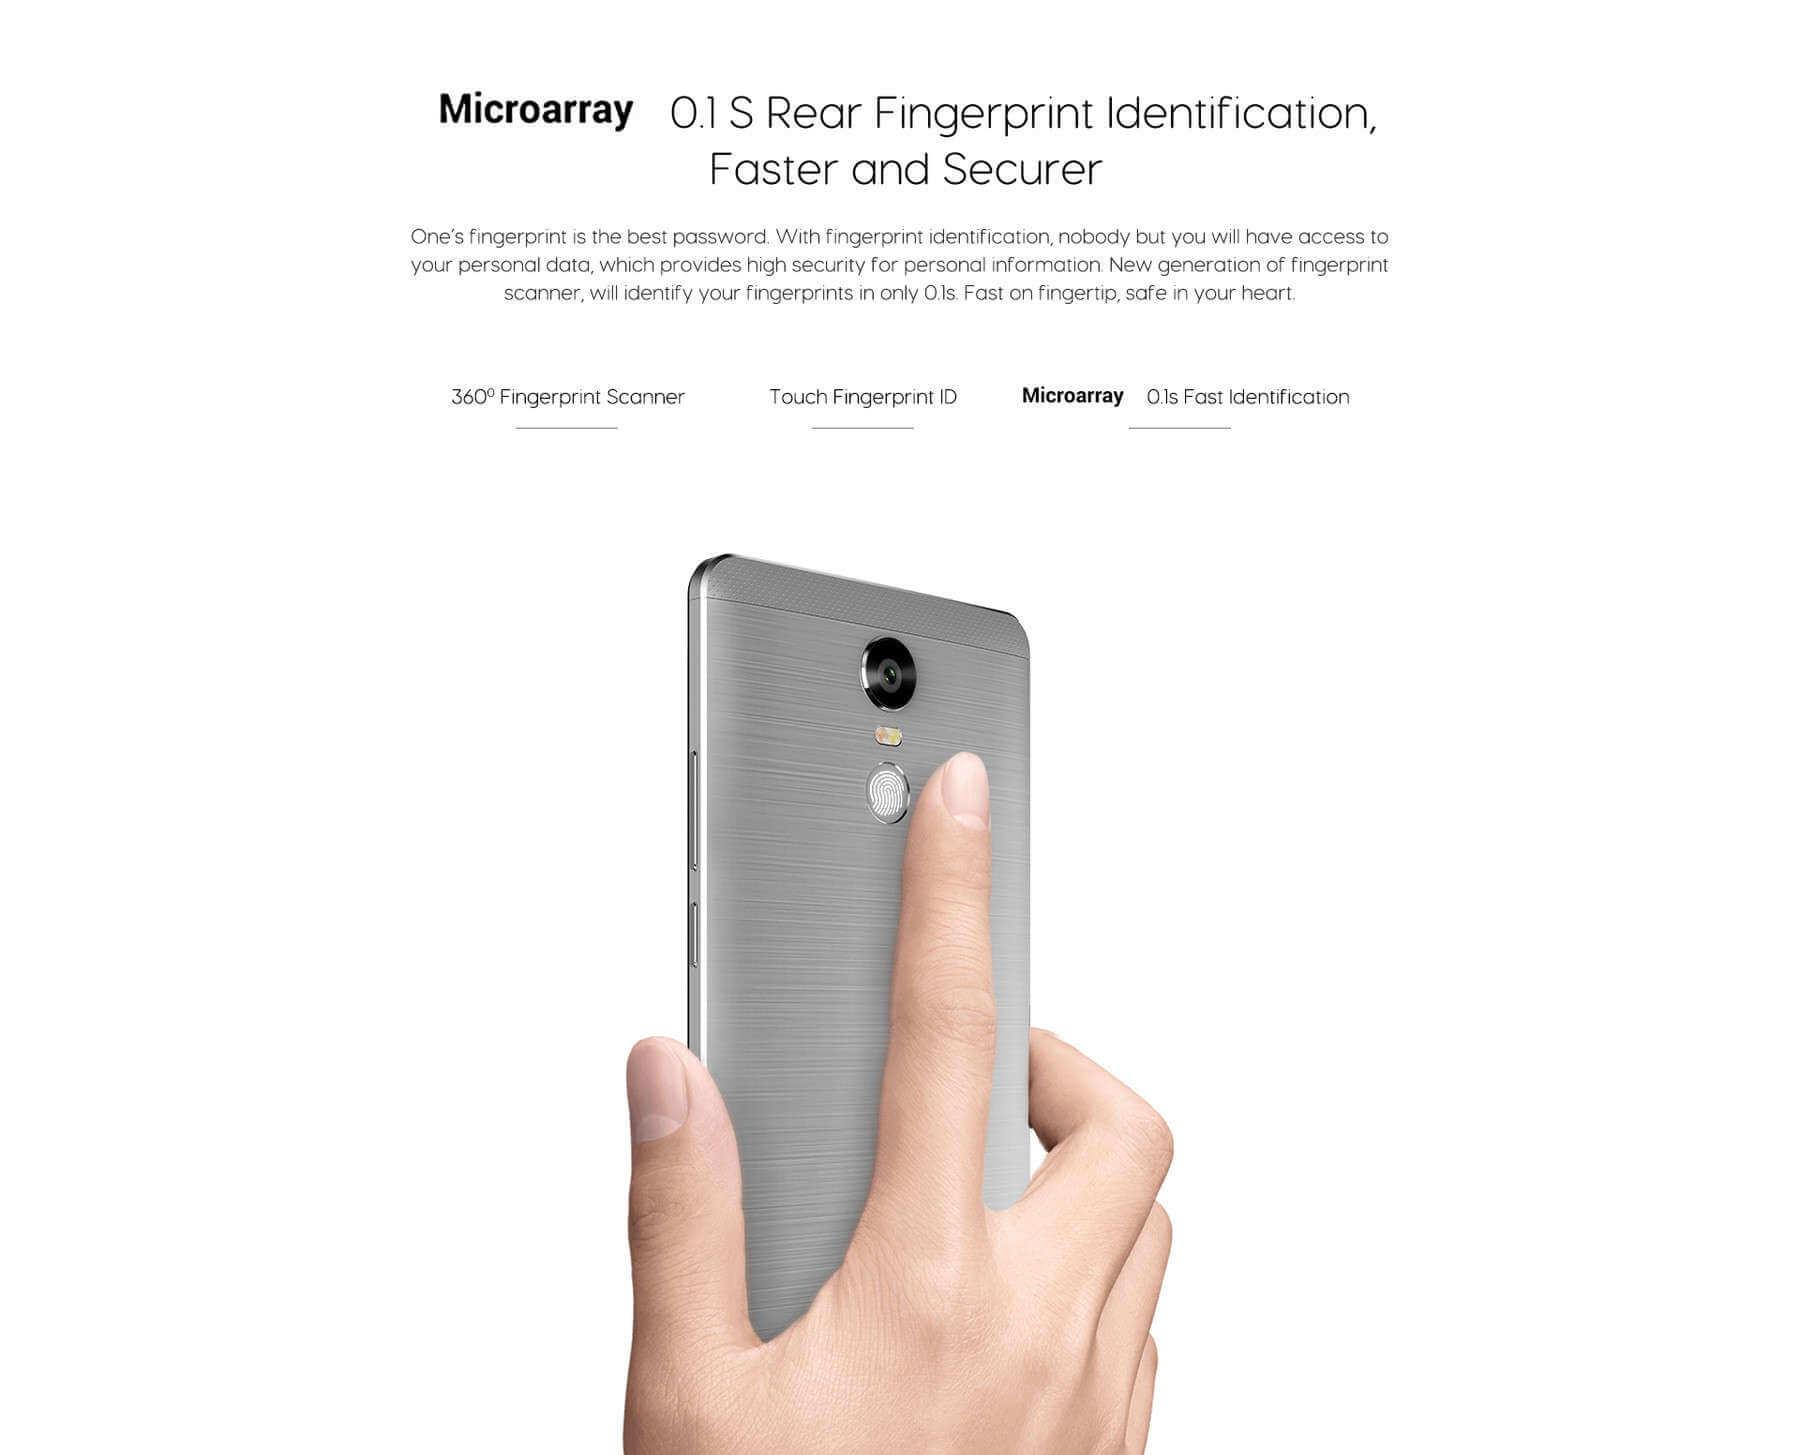 bluboo-maya-max-4g-phablet-fingerprint-scanner